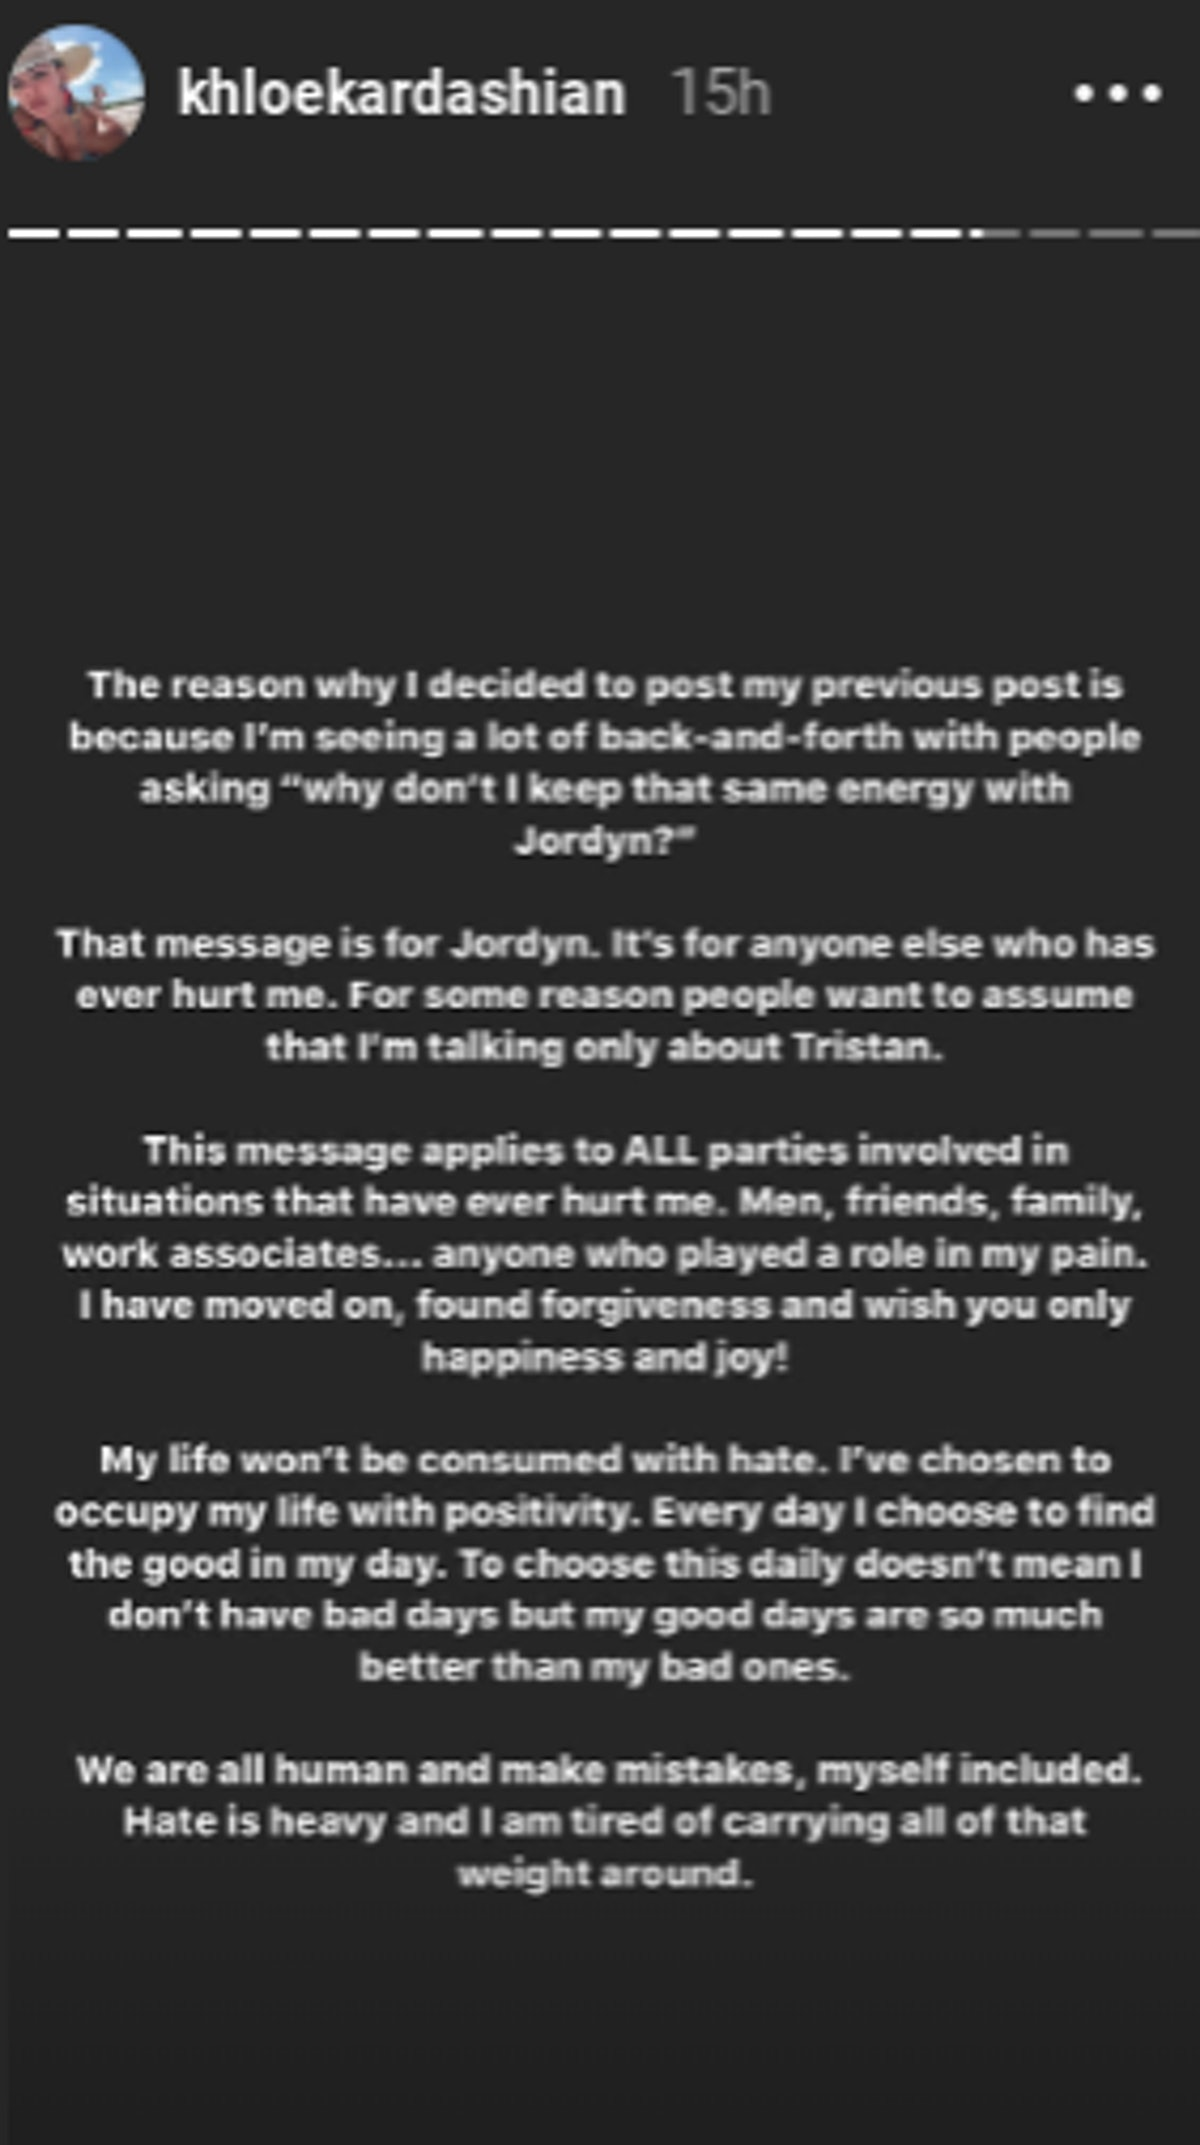 Khloe Kardashian's message of forgiveness to Jordyn Woods